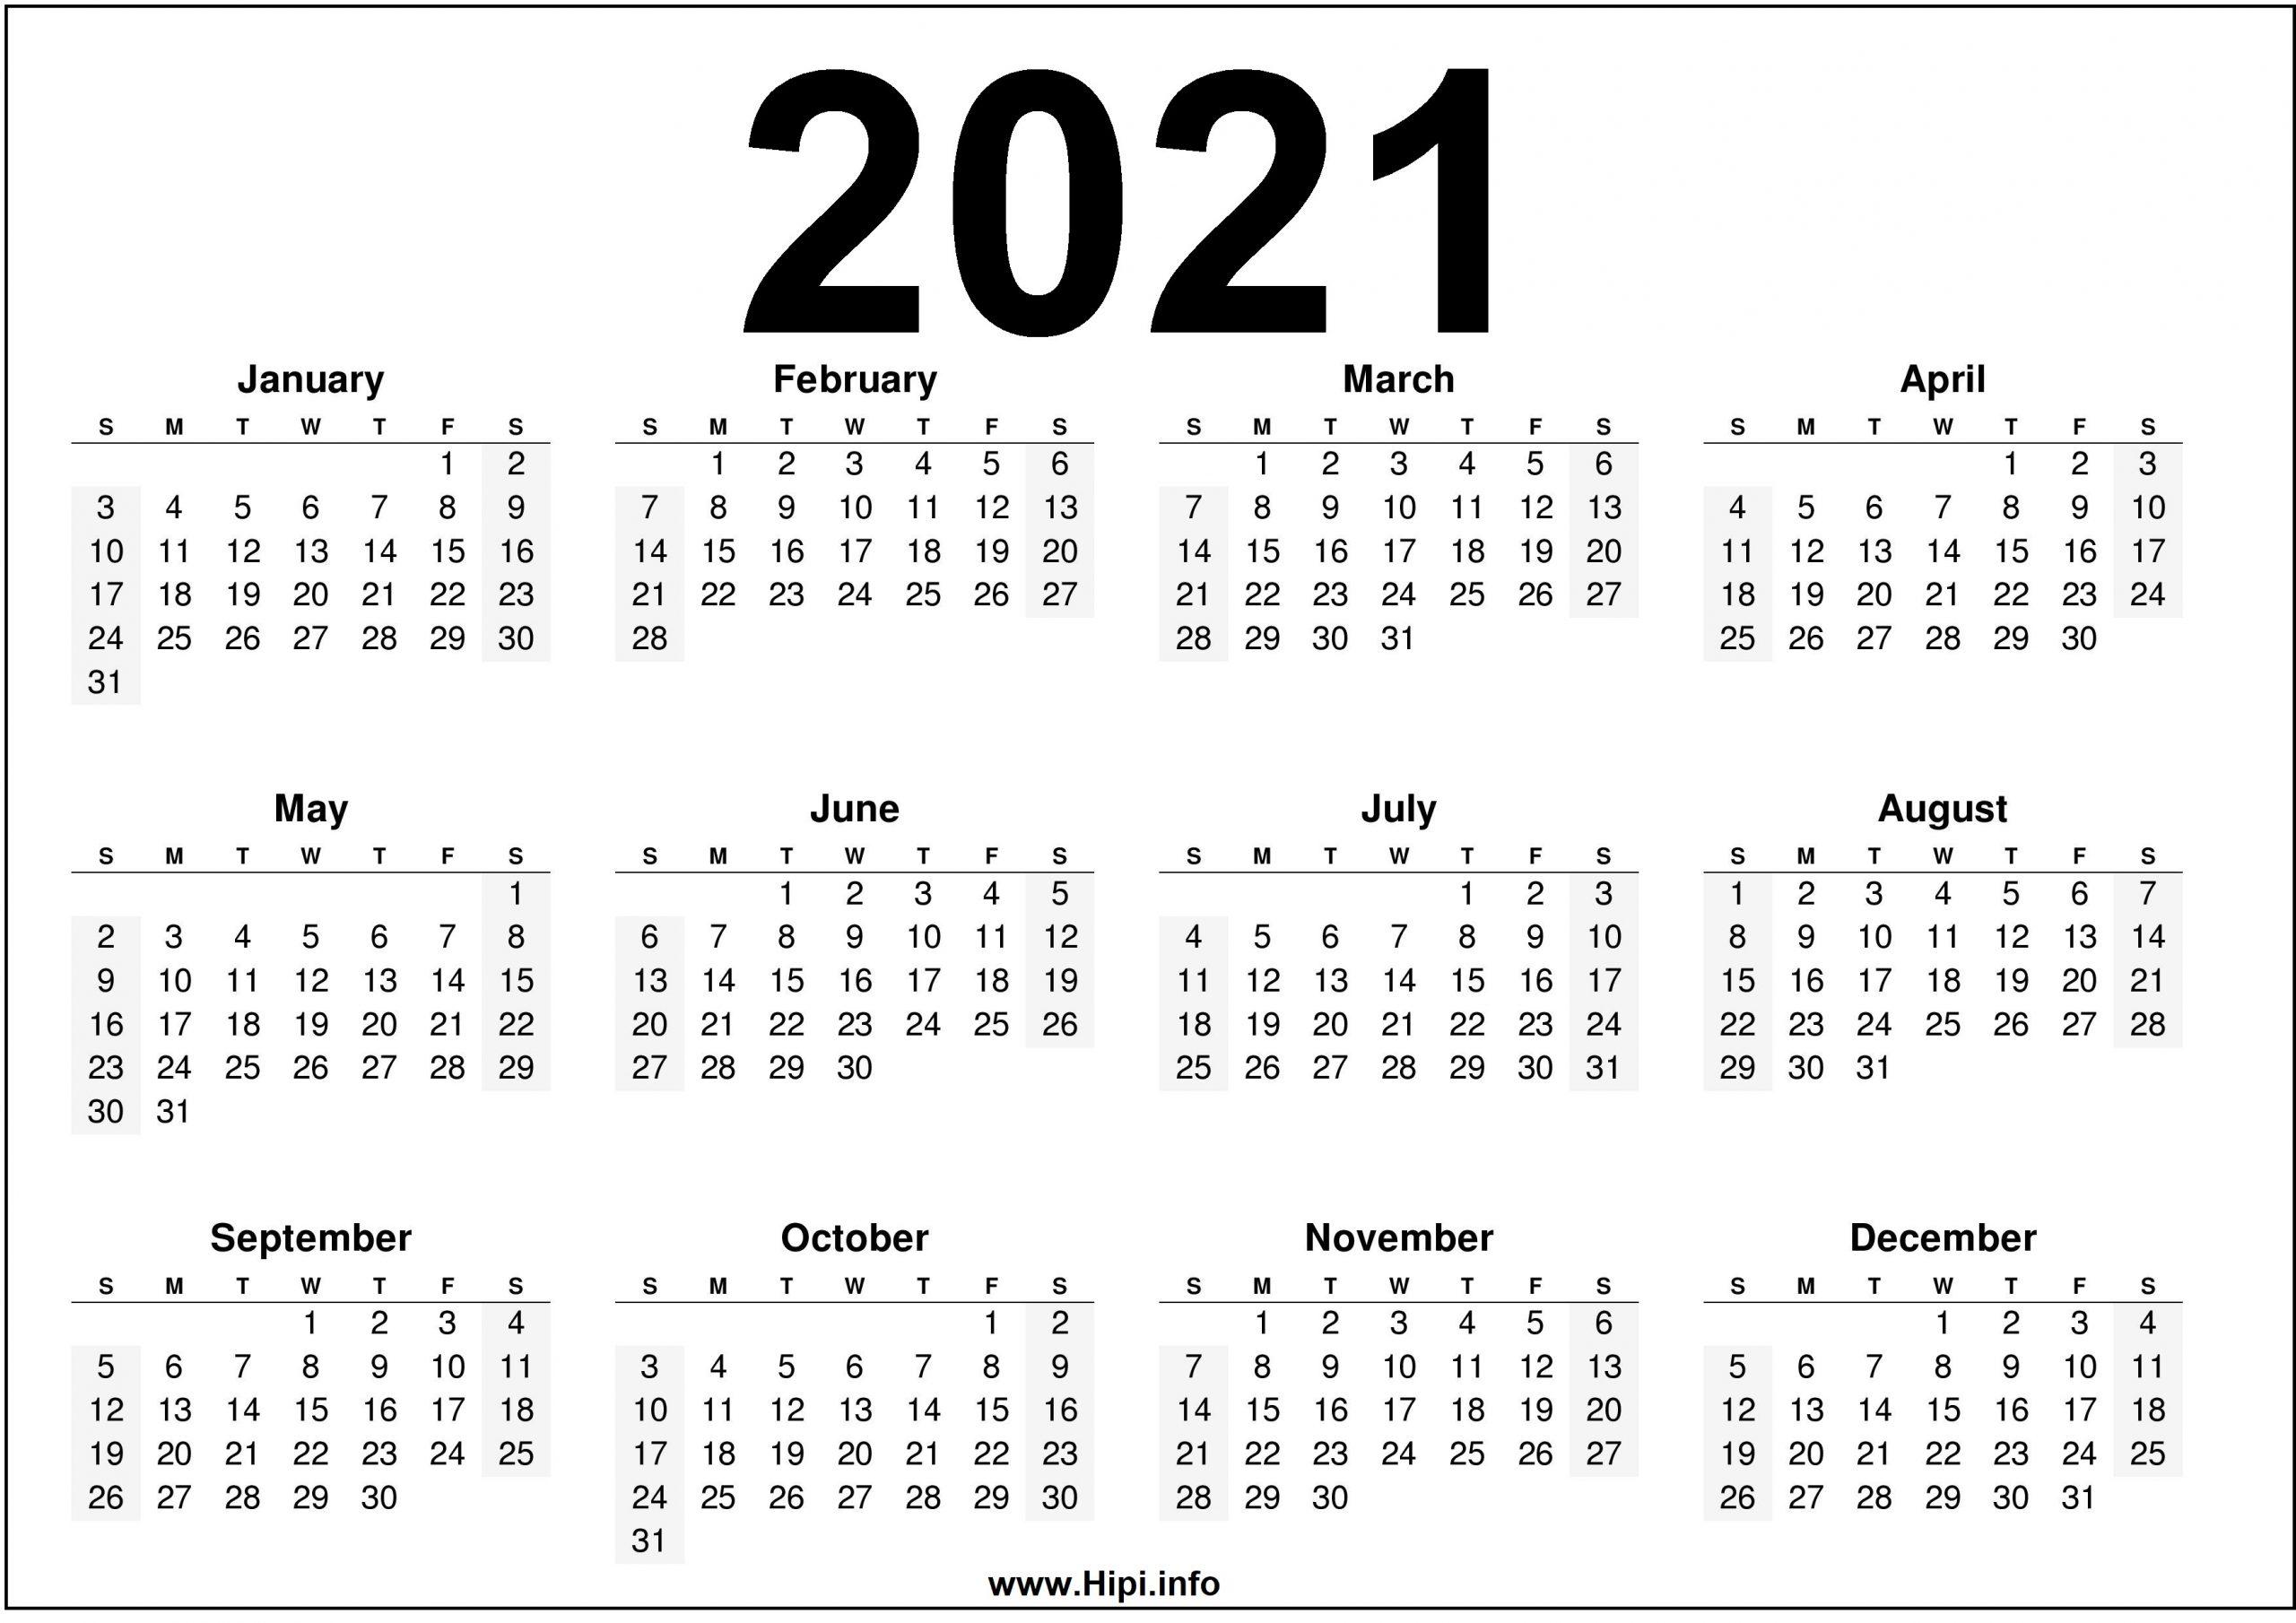 2021 Calendar Printable Free – Free Download - Hipi